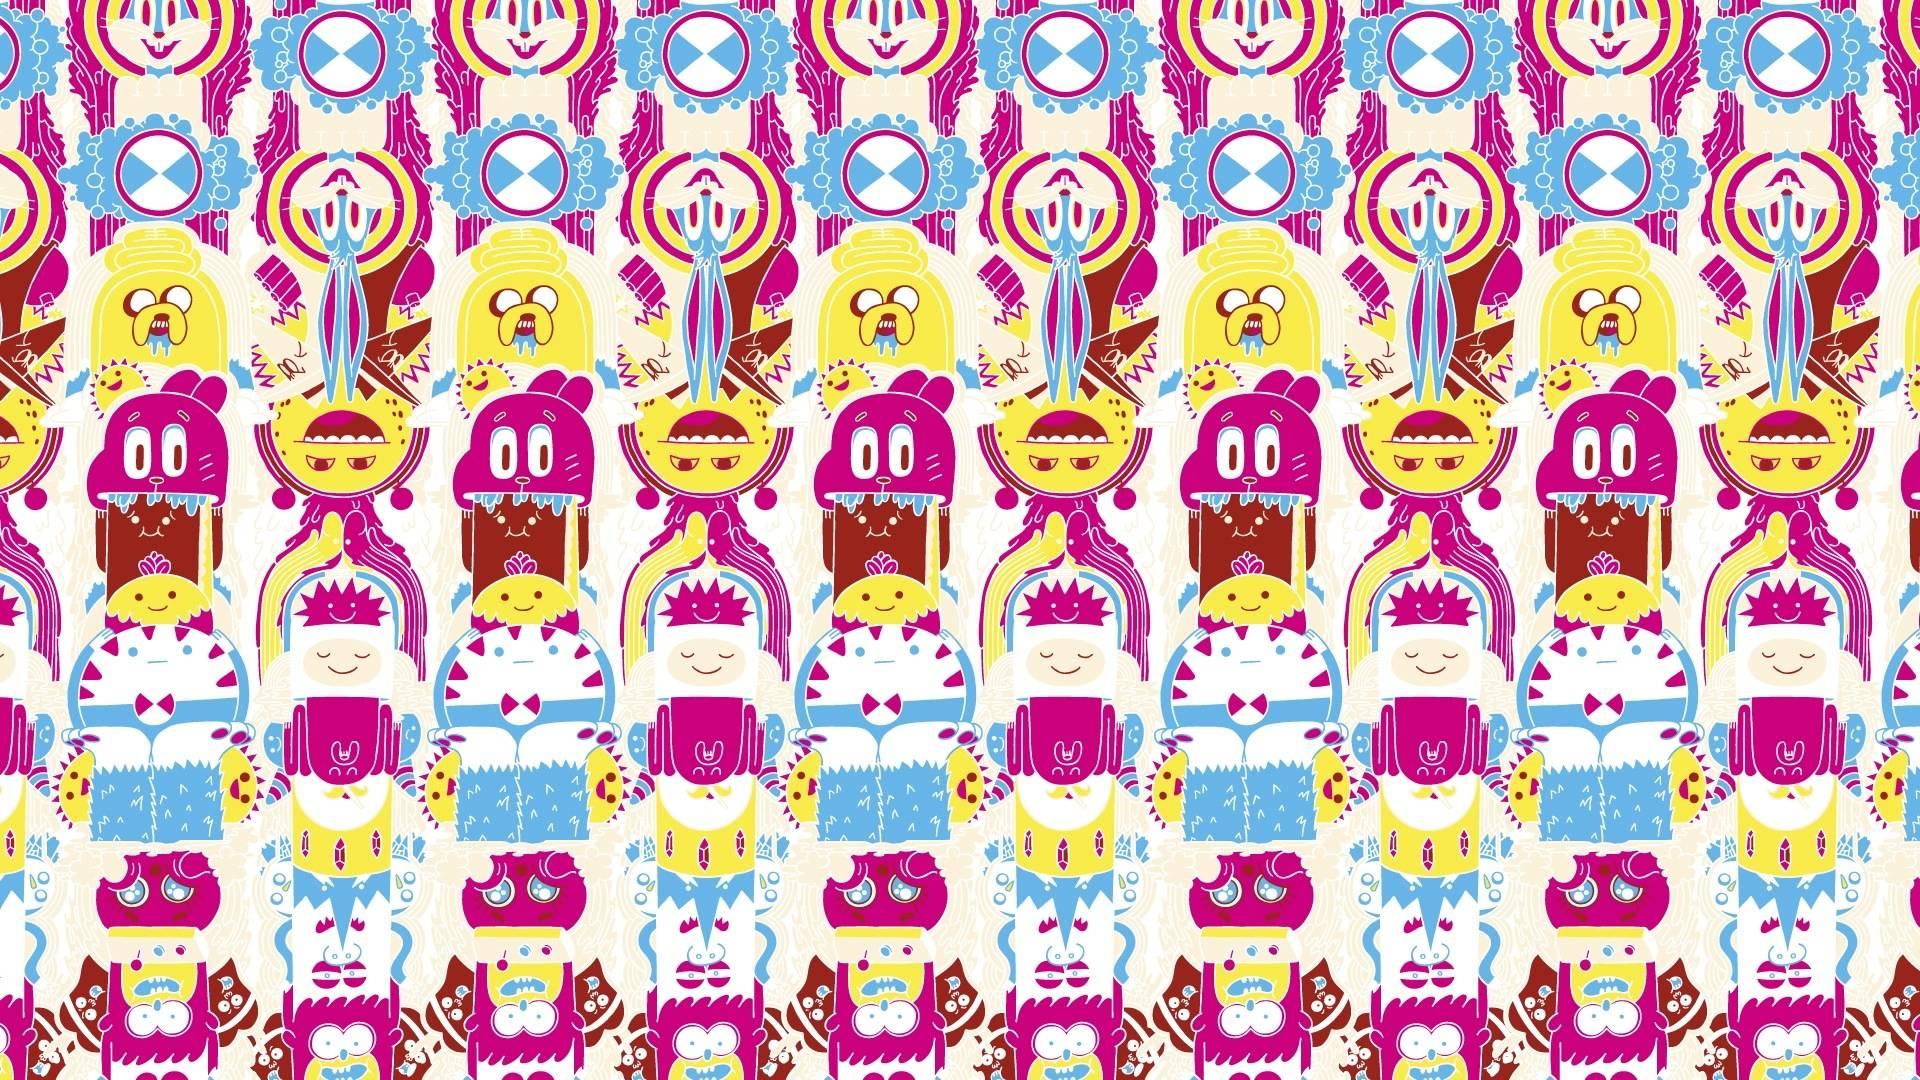 Cartoon Network Backgrounds 1920x1080